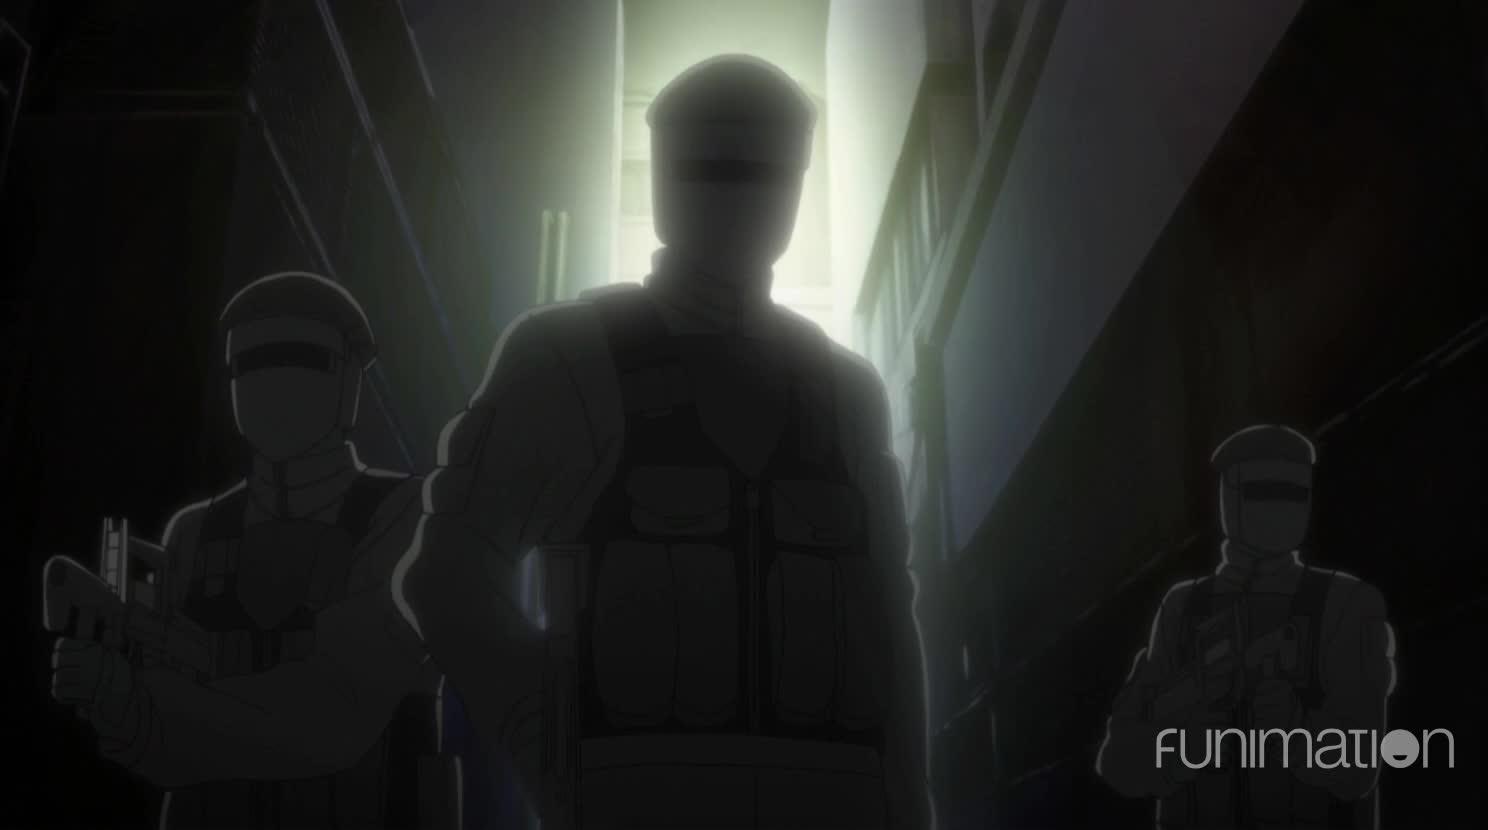 anime, funimation, sci-fi, scifi, steins gate, steins gate 0, steins;gate, steins;gate episode 11, steinsgate, steinsgate 0, vanish GIFs